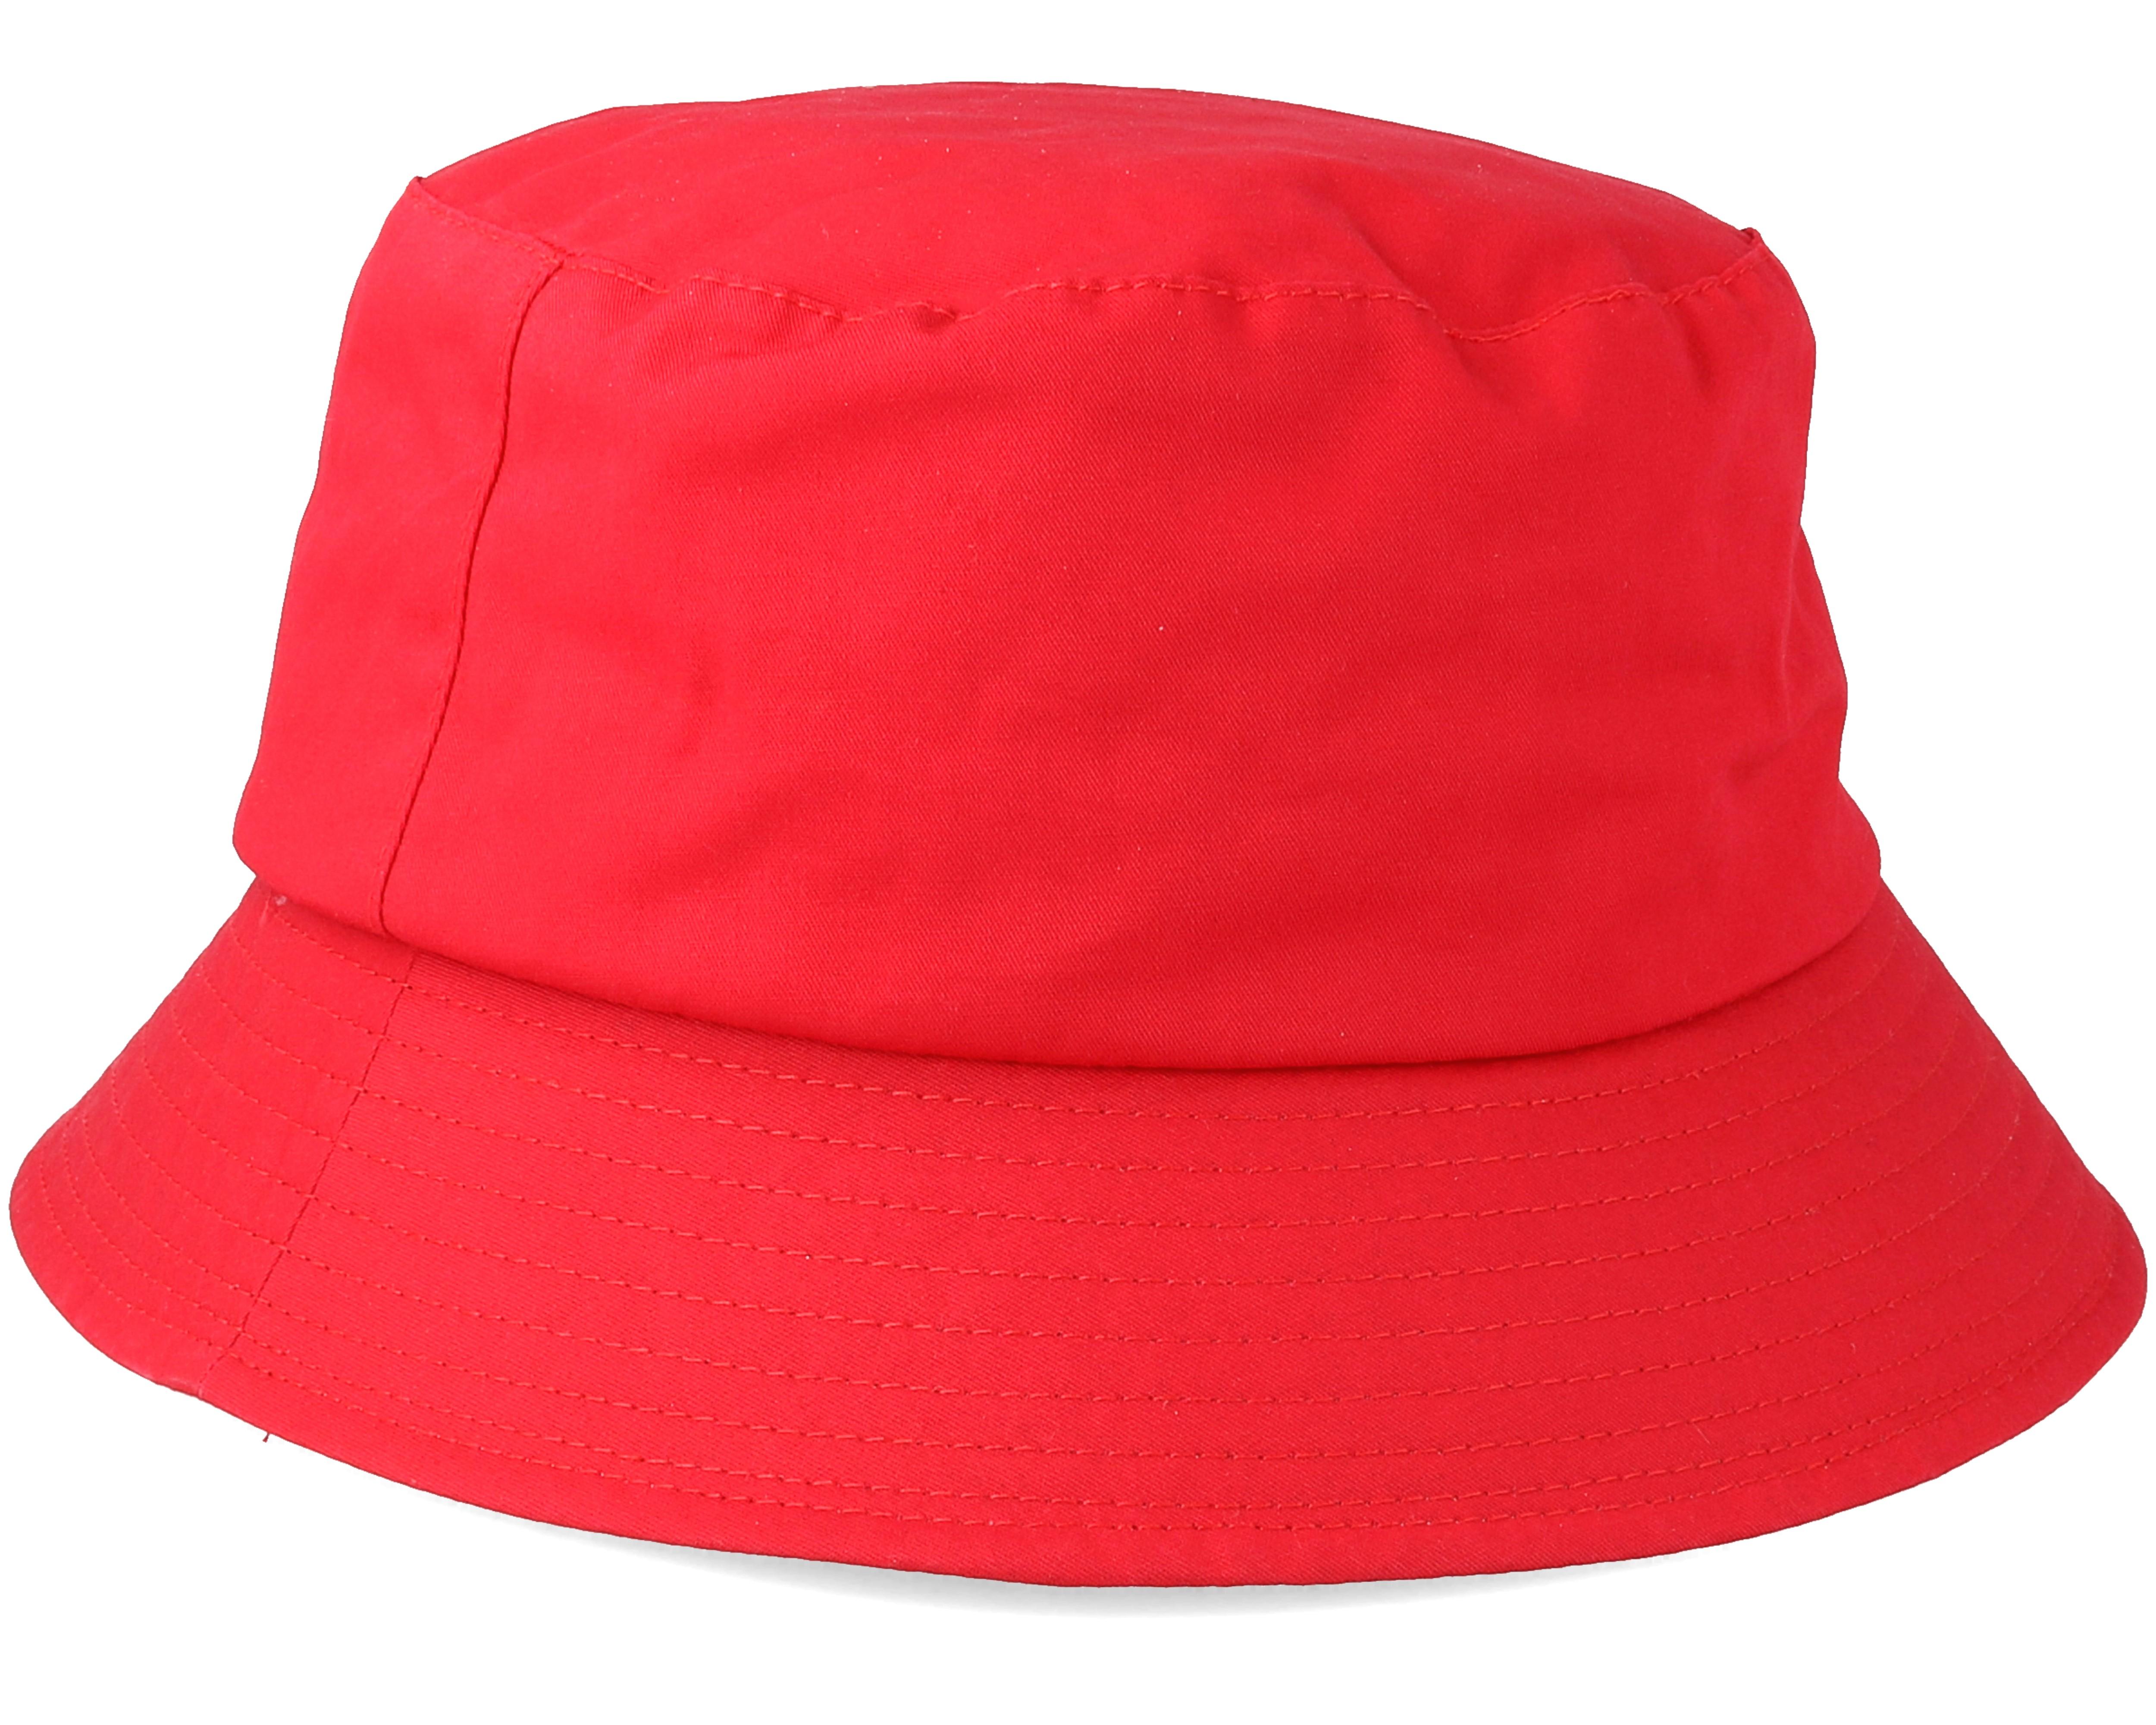 Universal works Men'S Bucket Hat in Red for Men | Lyst  |Red Bucket Hat